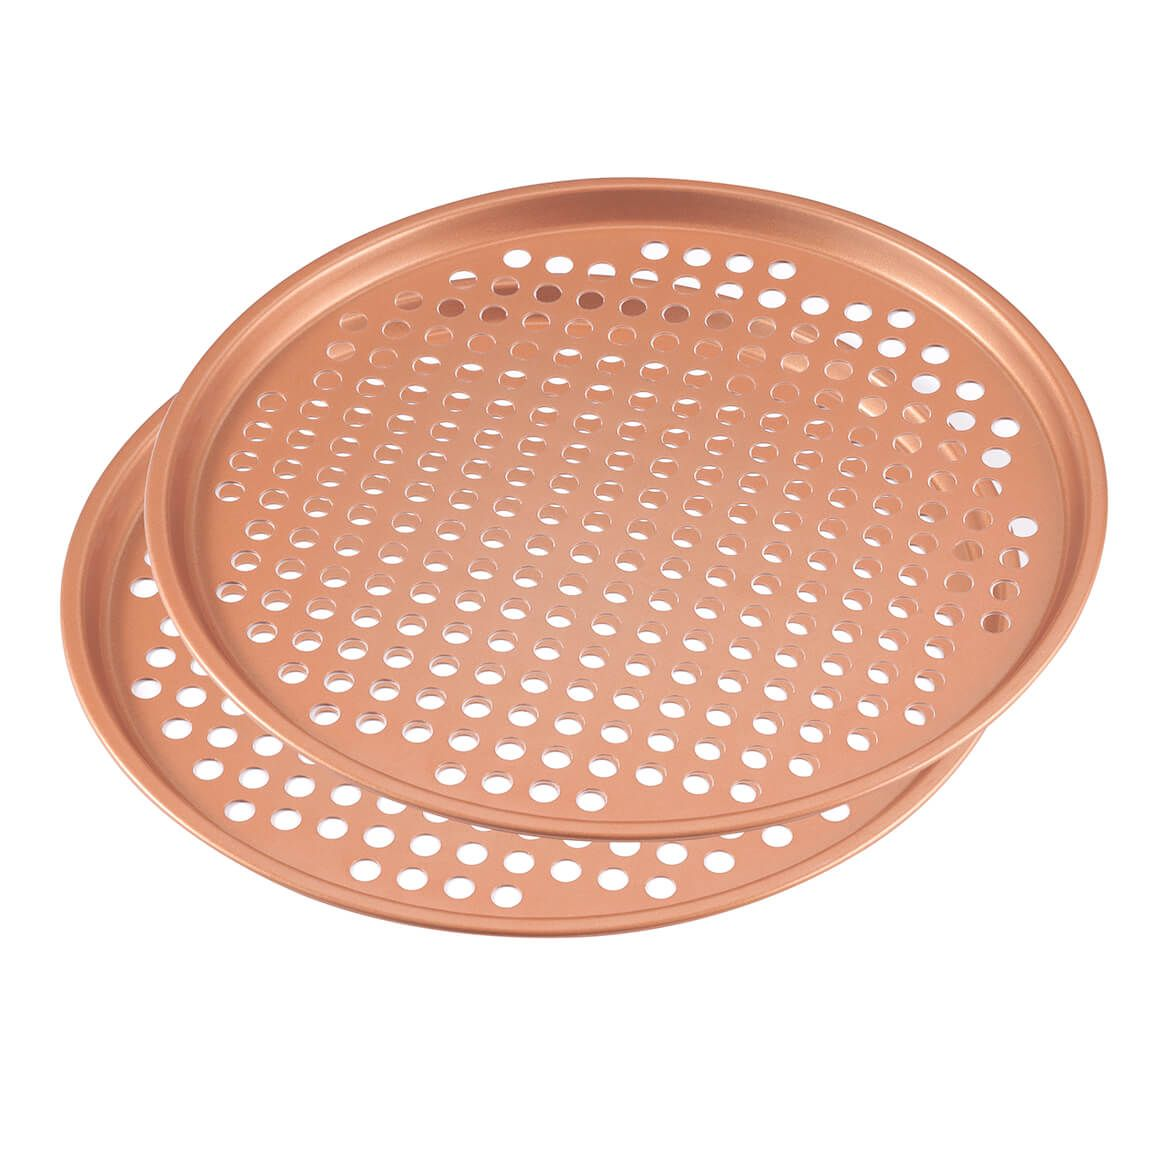 "12.5"" Ceramic Copper Pizza Pans, Set of 2-367112"